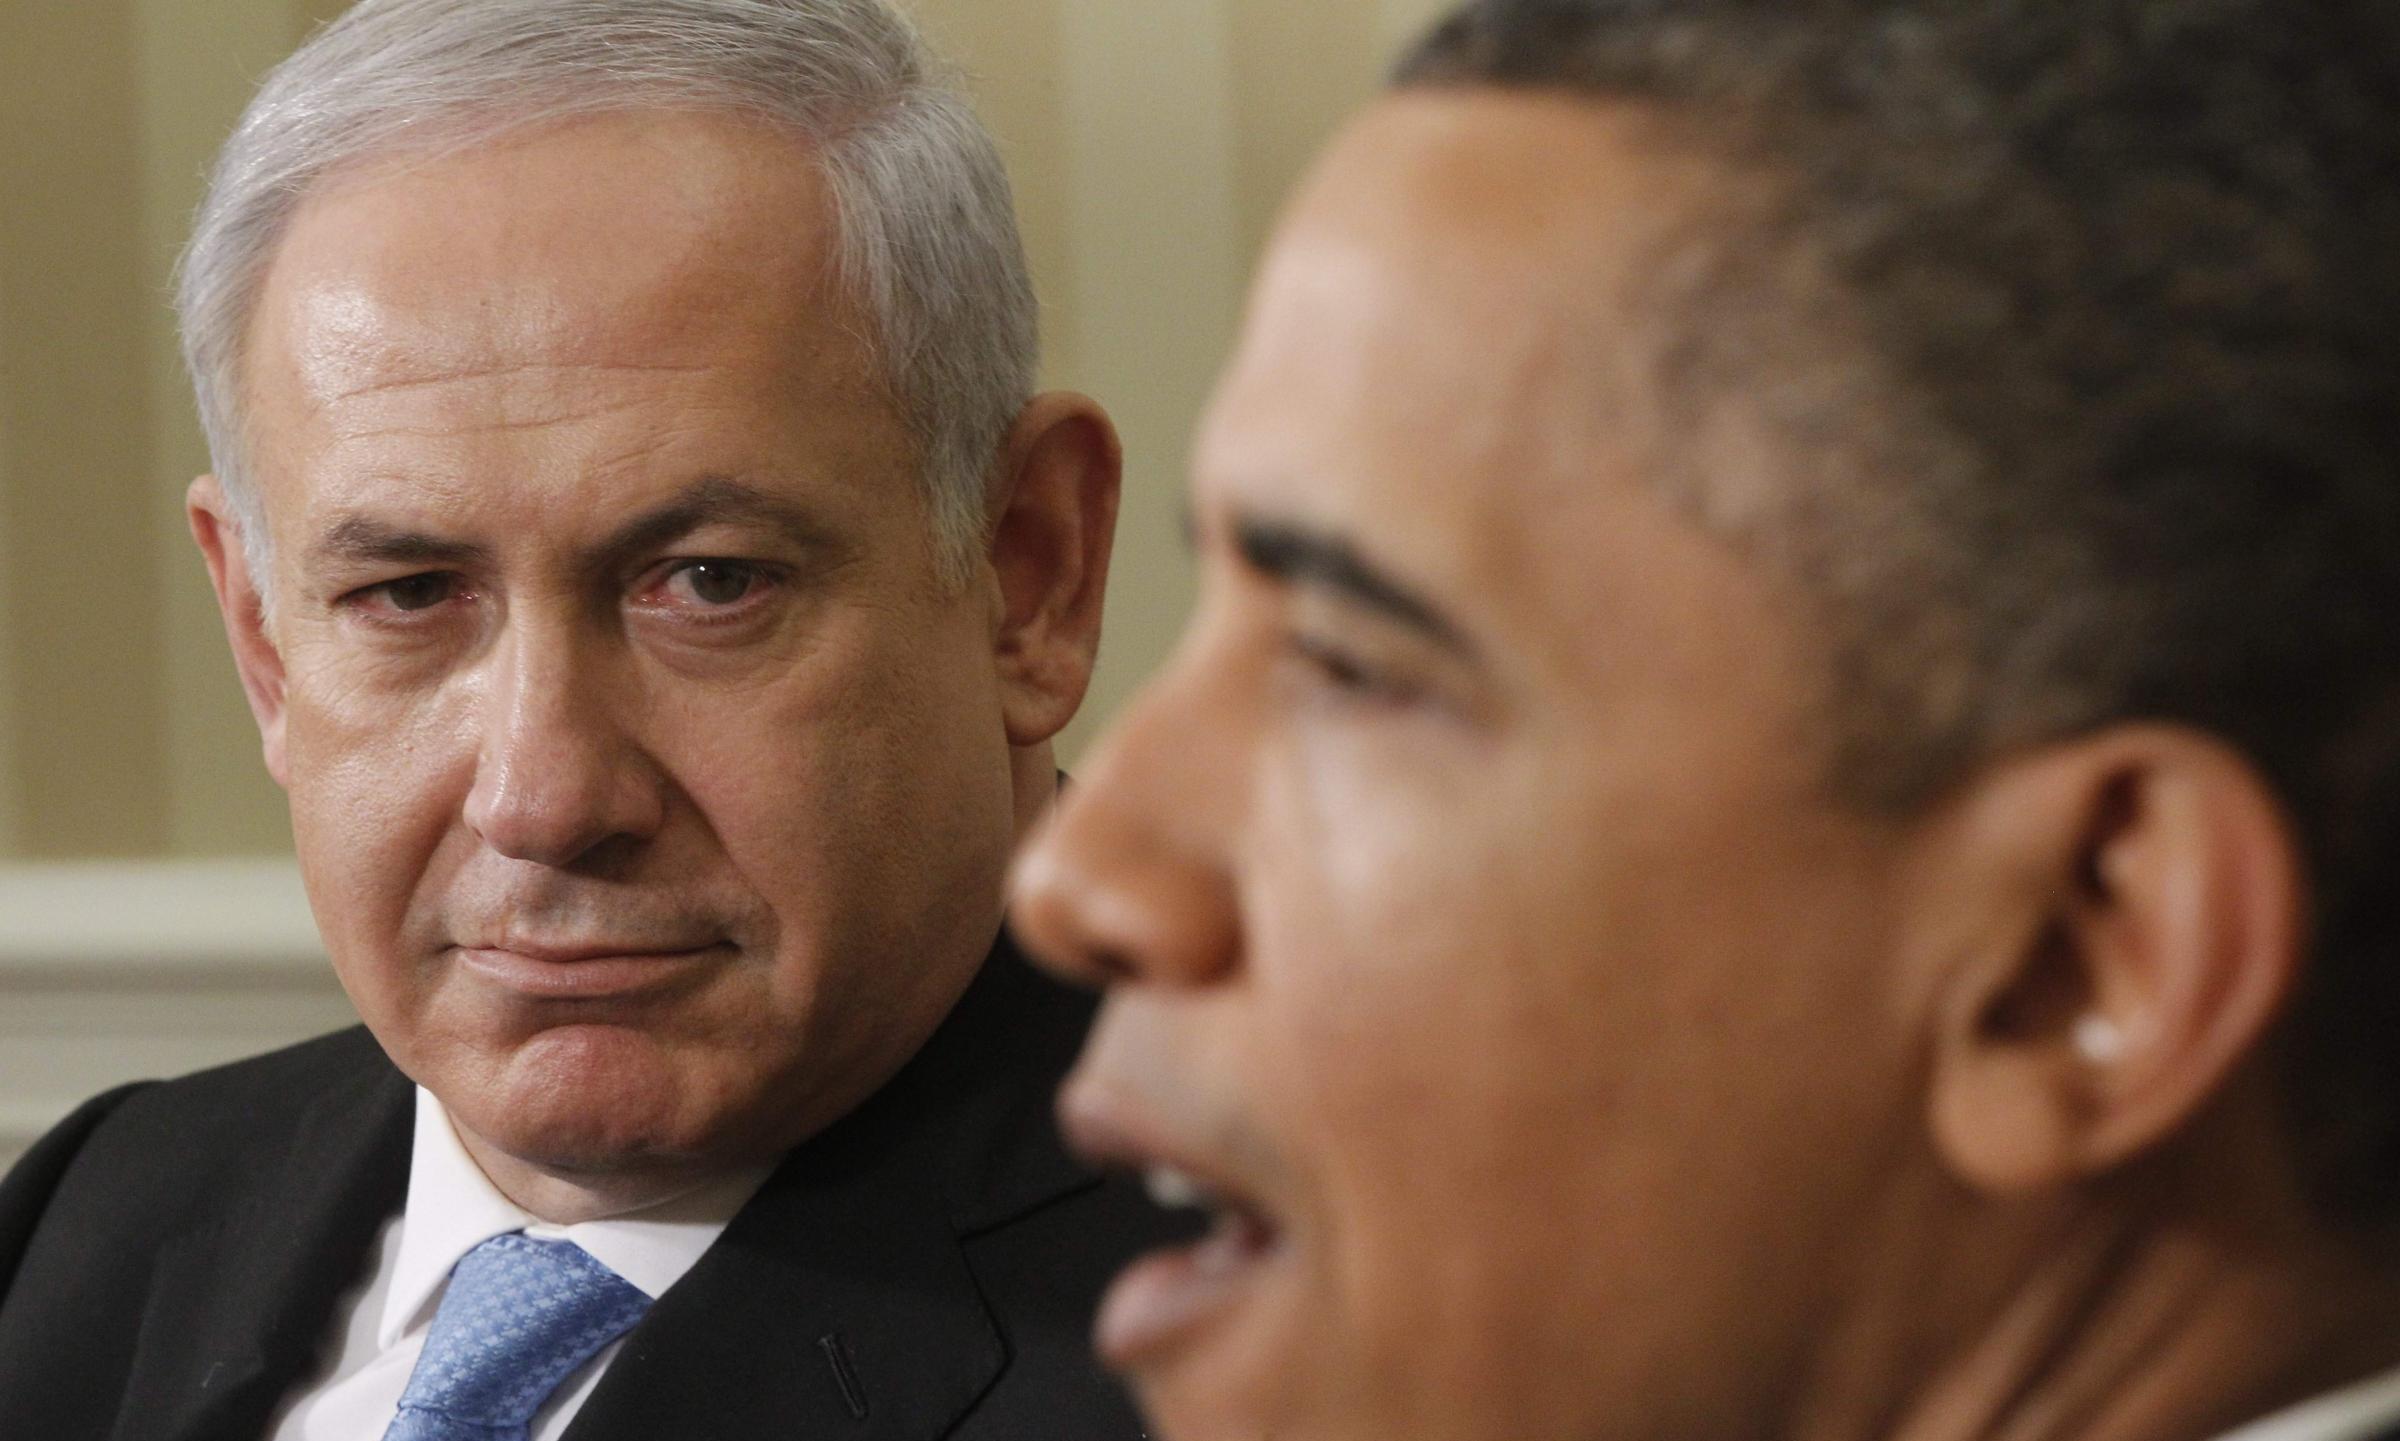 Guerra Iran-Israele. Quando e perchè.